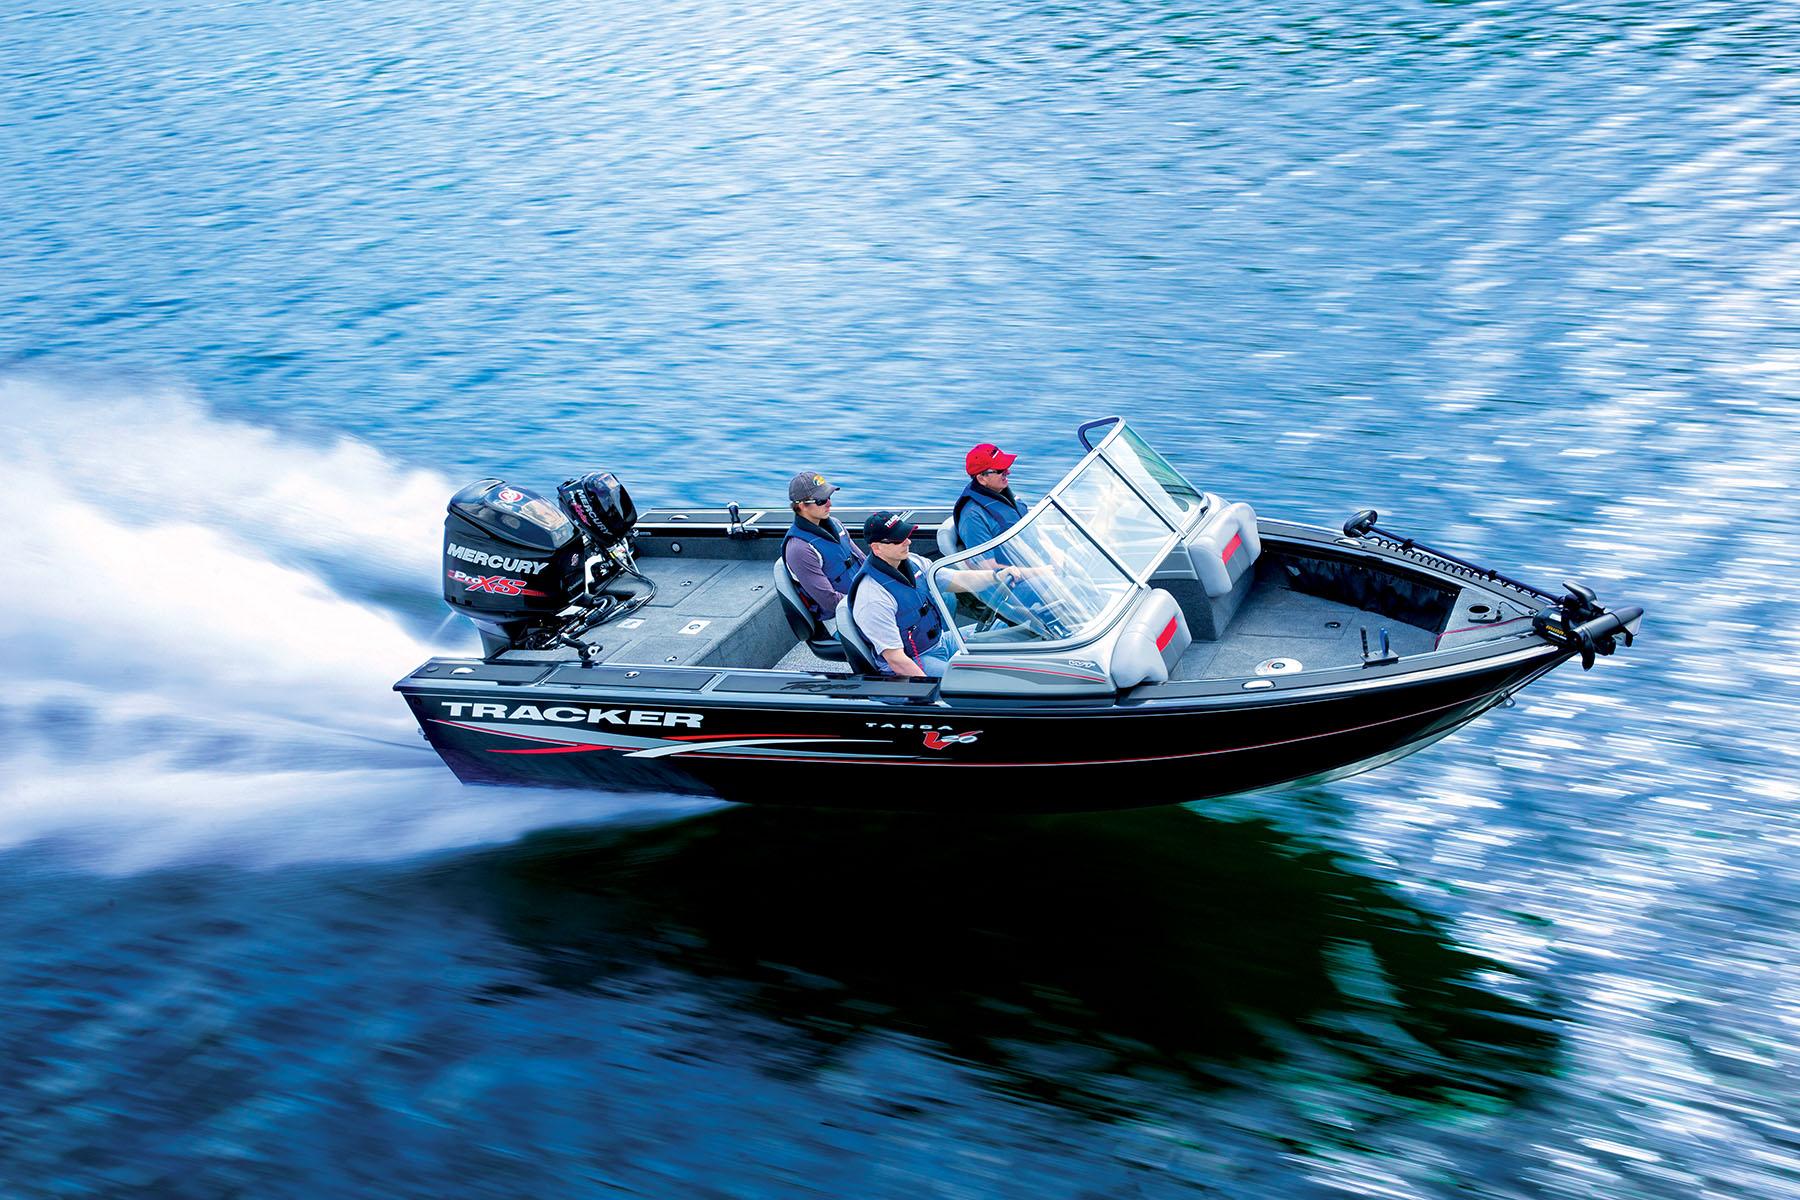 Bass pro shops news releases the 2016 tracker targa v 20 for Bass pro shop fishing kayaks